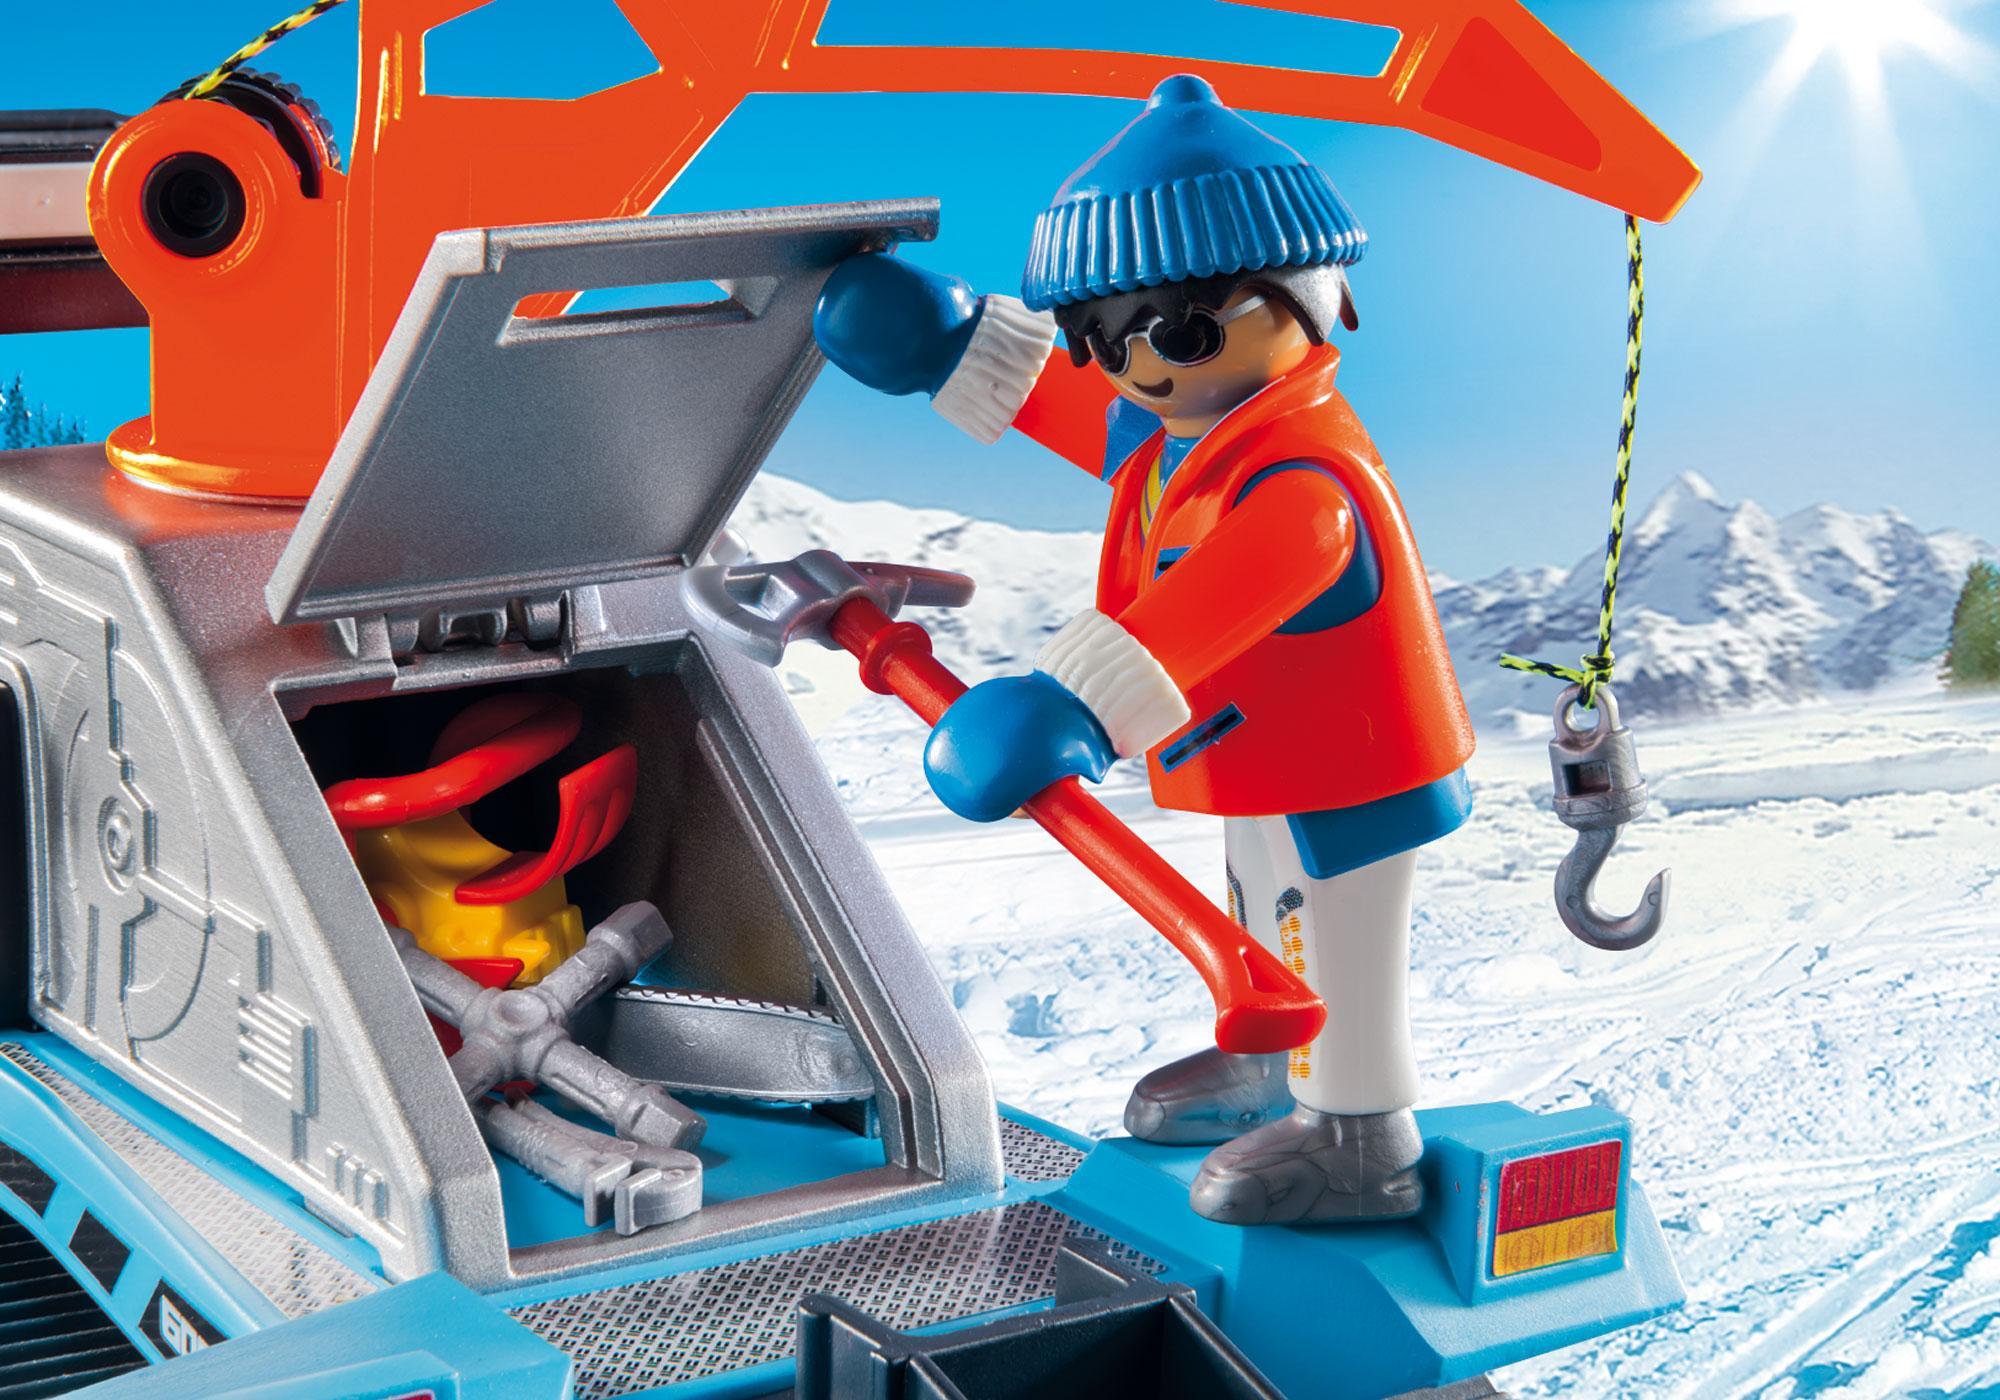 http://media.playmobil.com/i/playmobil/9500_product_extra1/Agent avec chasse-neige